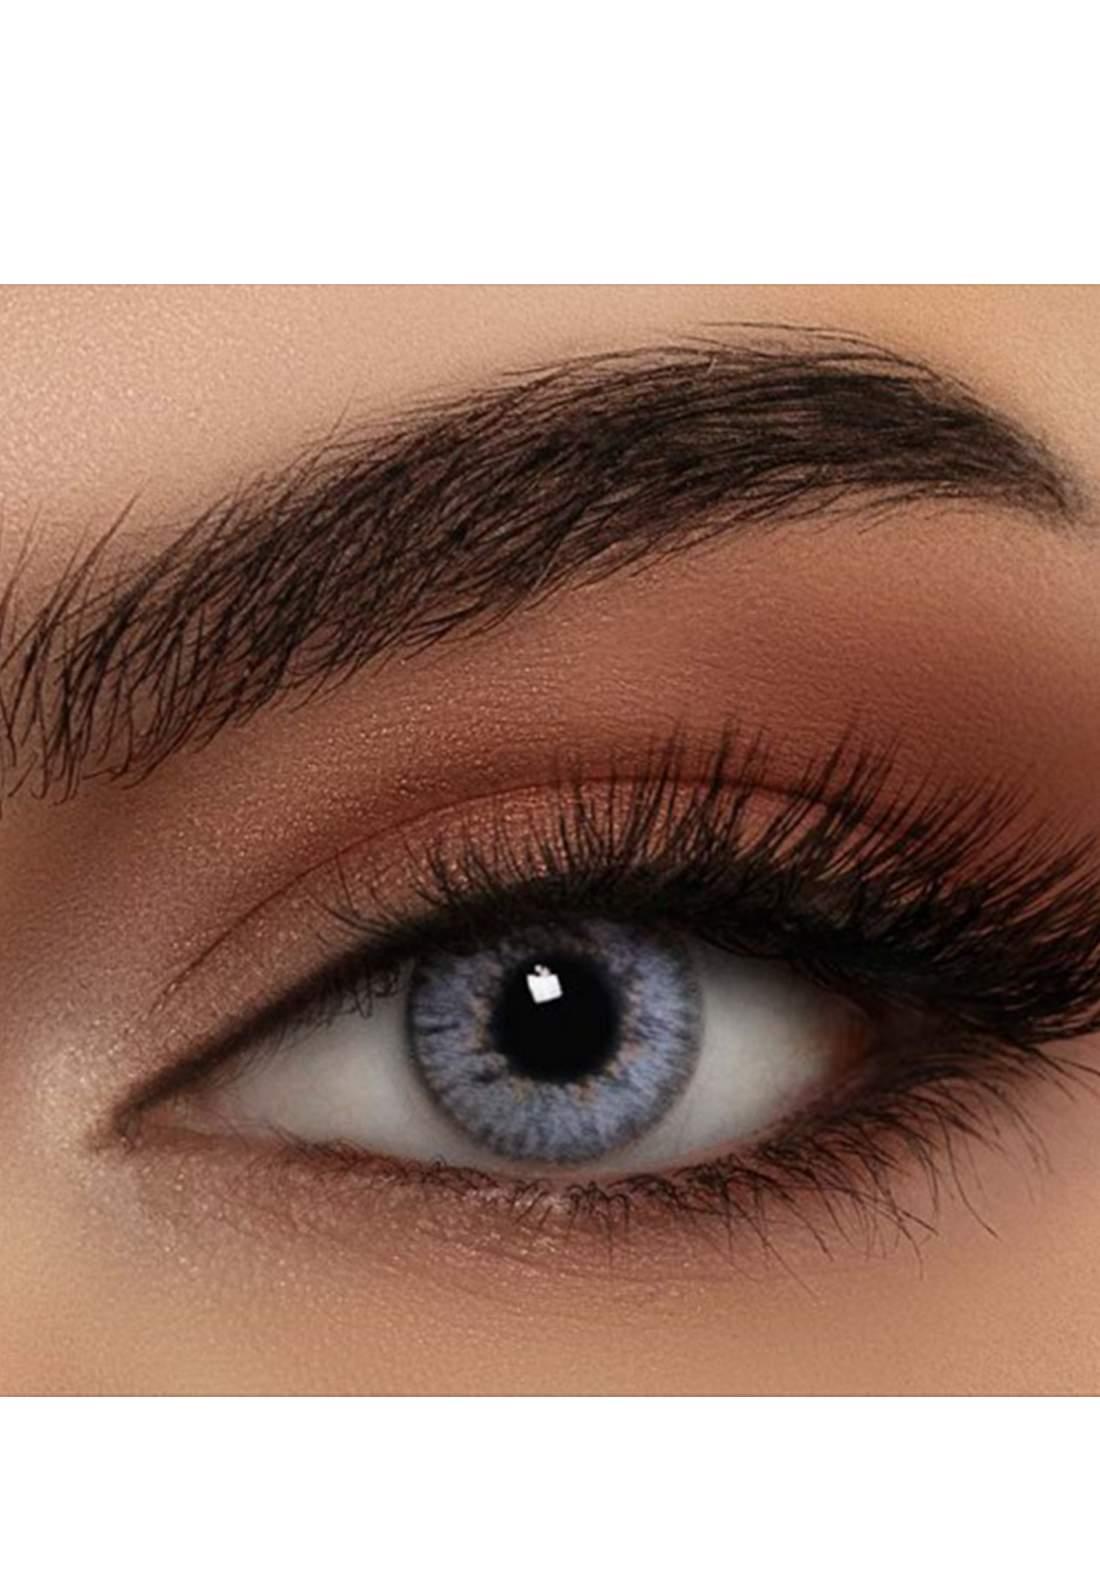 Bella Classic 301028 Contact Lenses 3 Months Use Natural - Gray Blue No.29 عدسات لاصقة